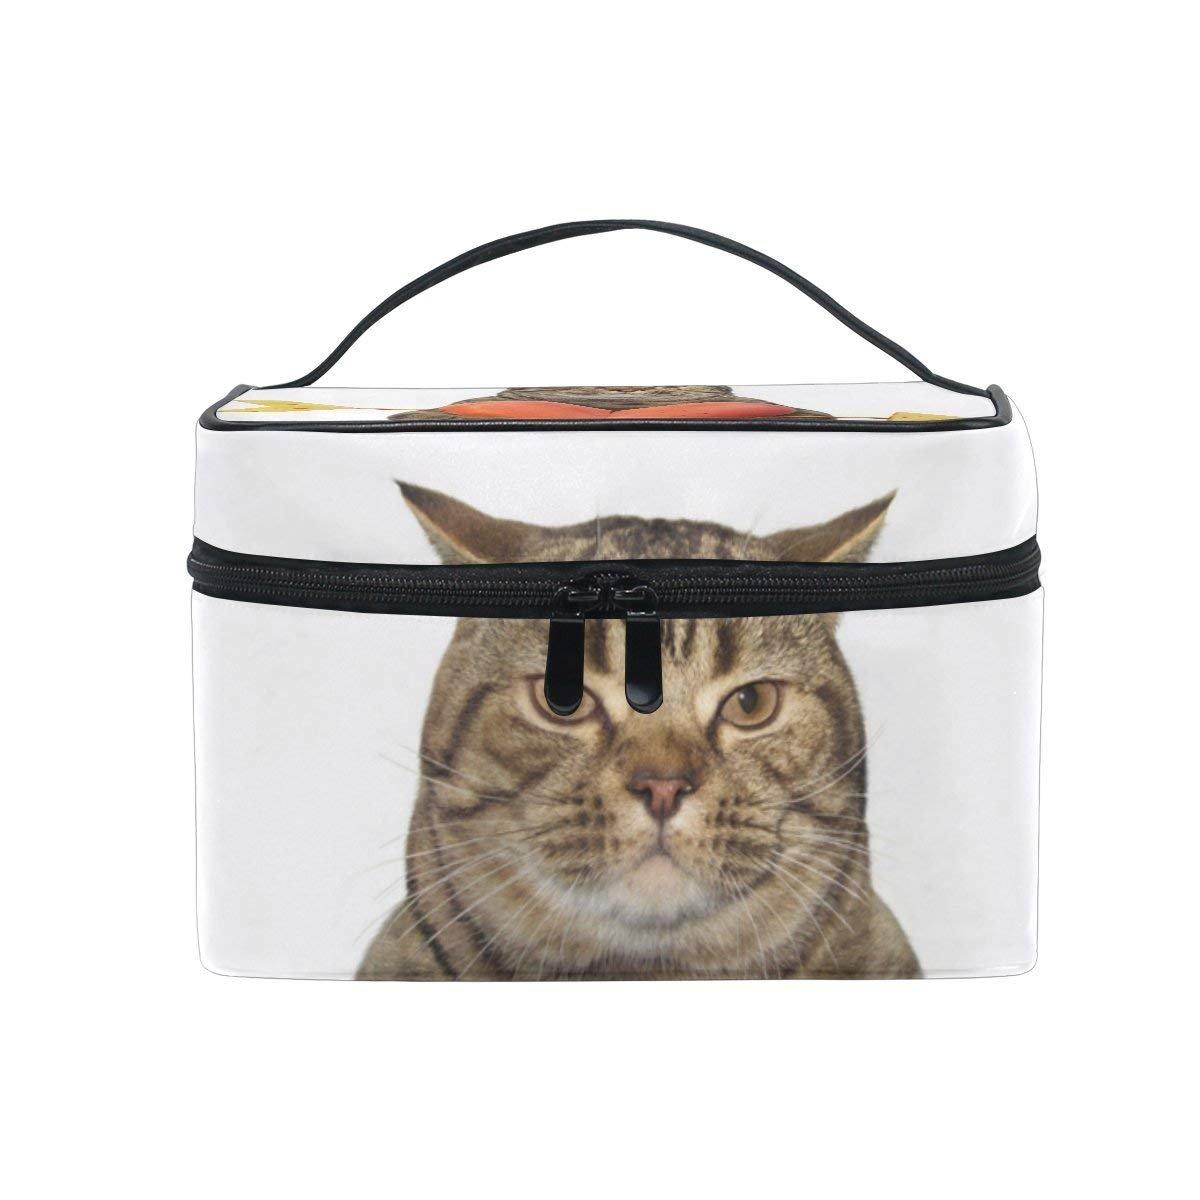 Makeup Bag Funny Cat Hold Love Heart Mens Travel Toiletry Bag Mens Cosmetic Bags for Women Fun Large Makeup Organizer